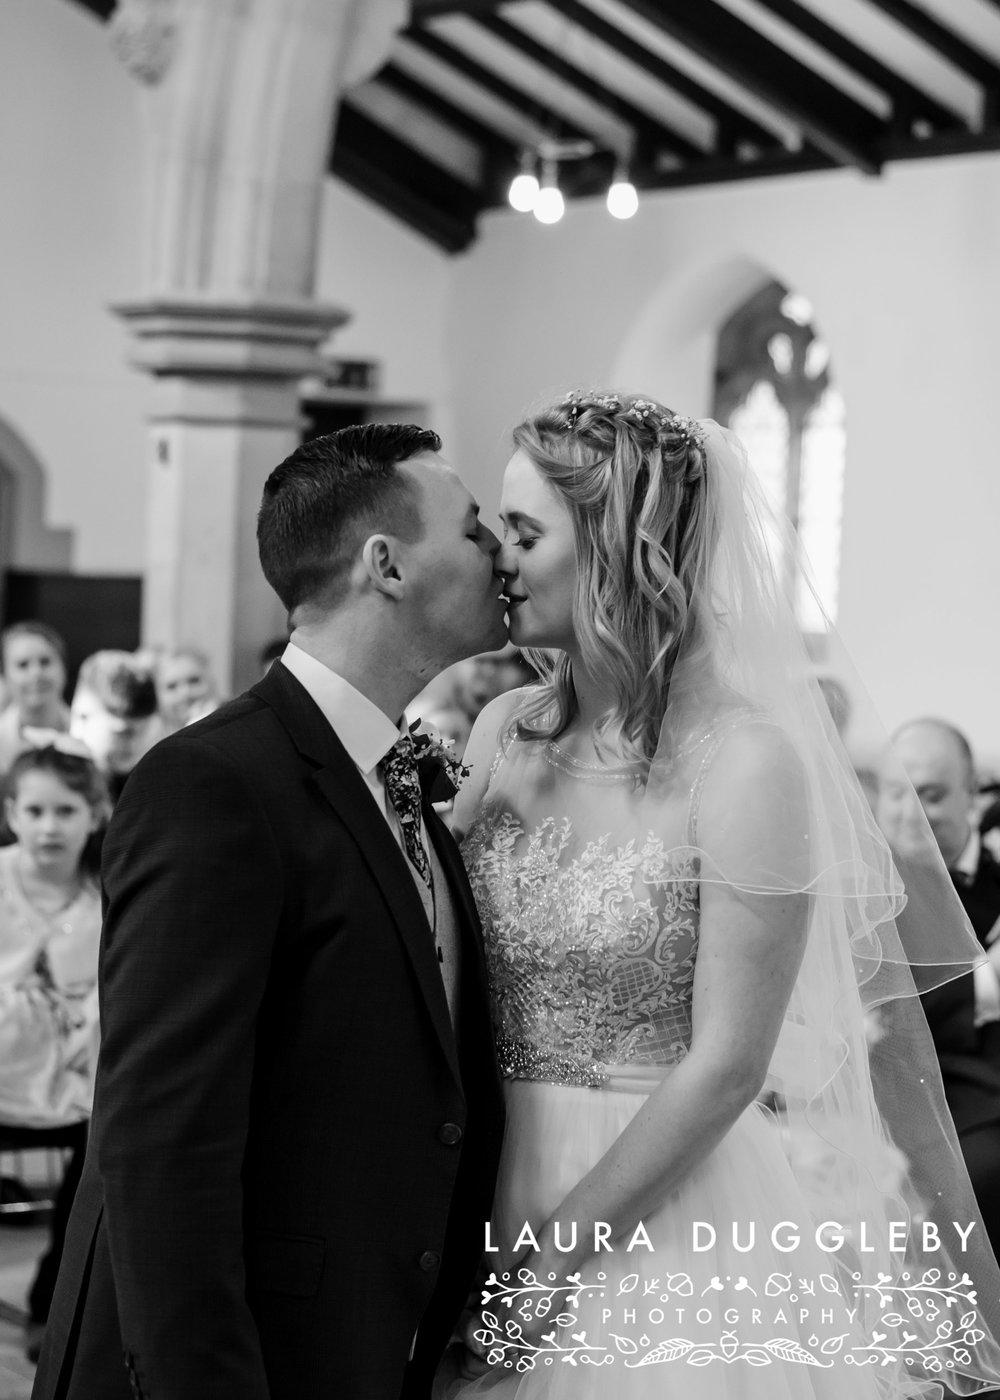 Mawdesley Village Hall - Lancashire Wedding Photographer - Laura Duggleby Photography4